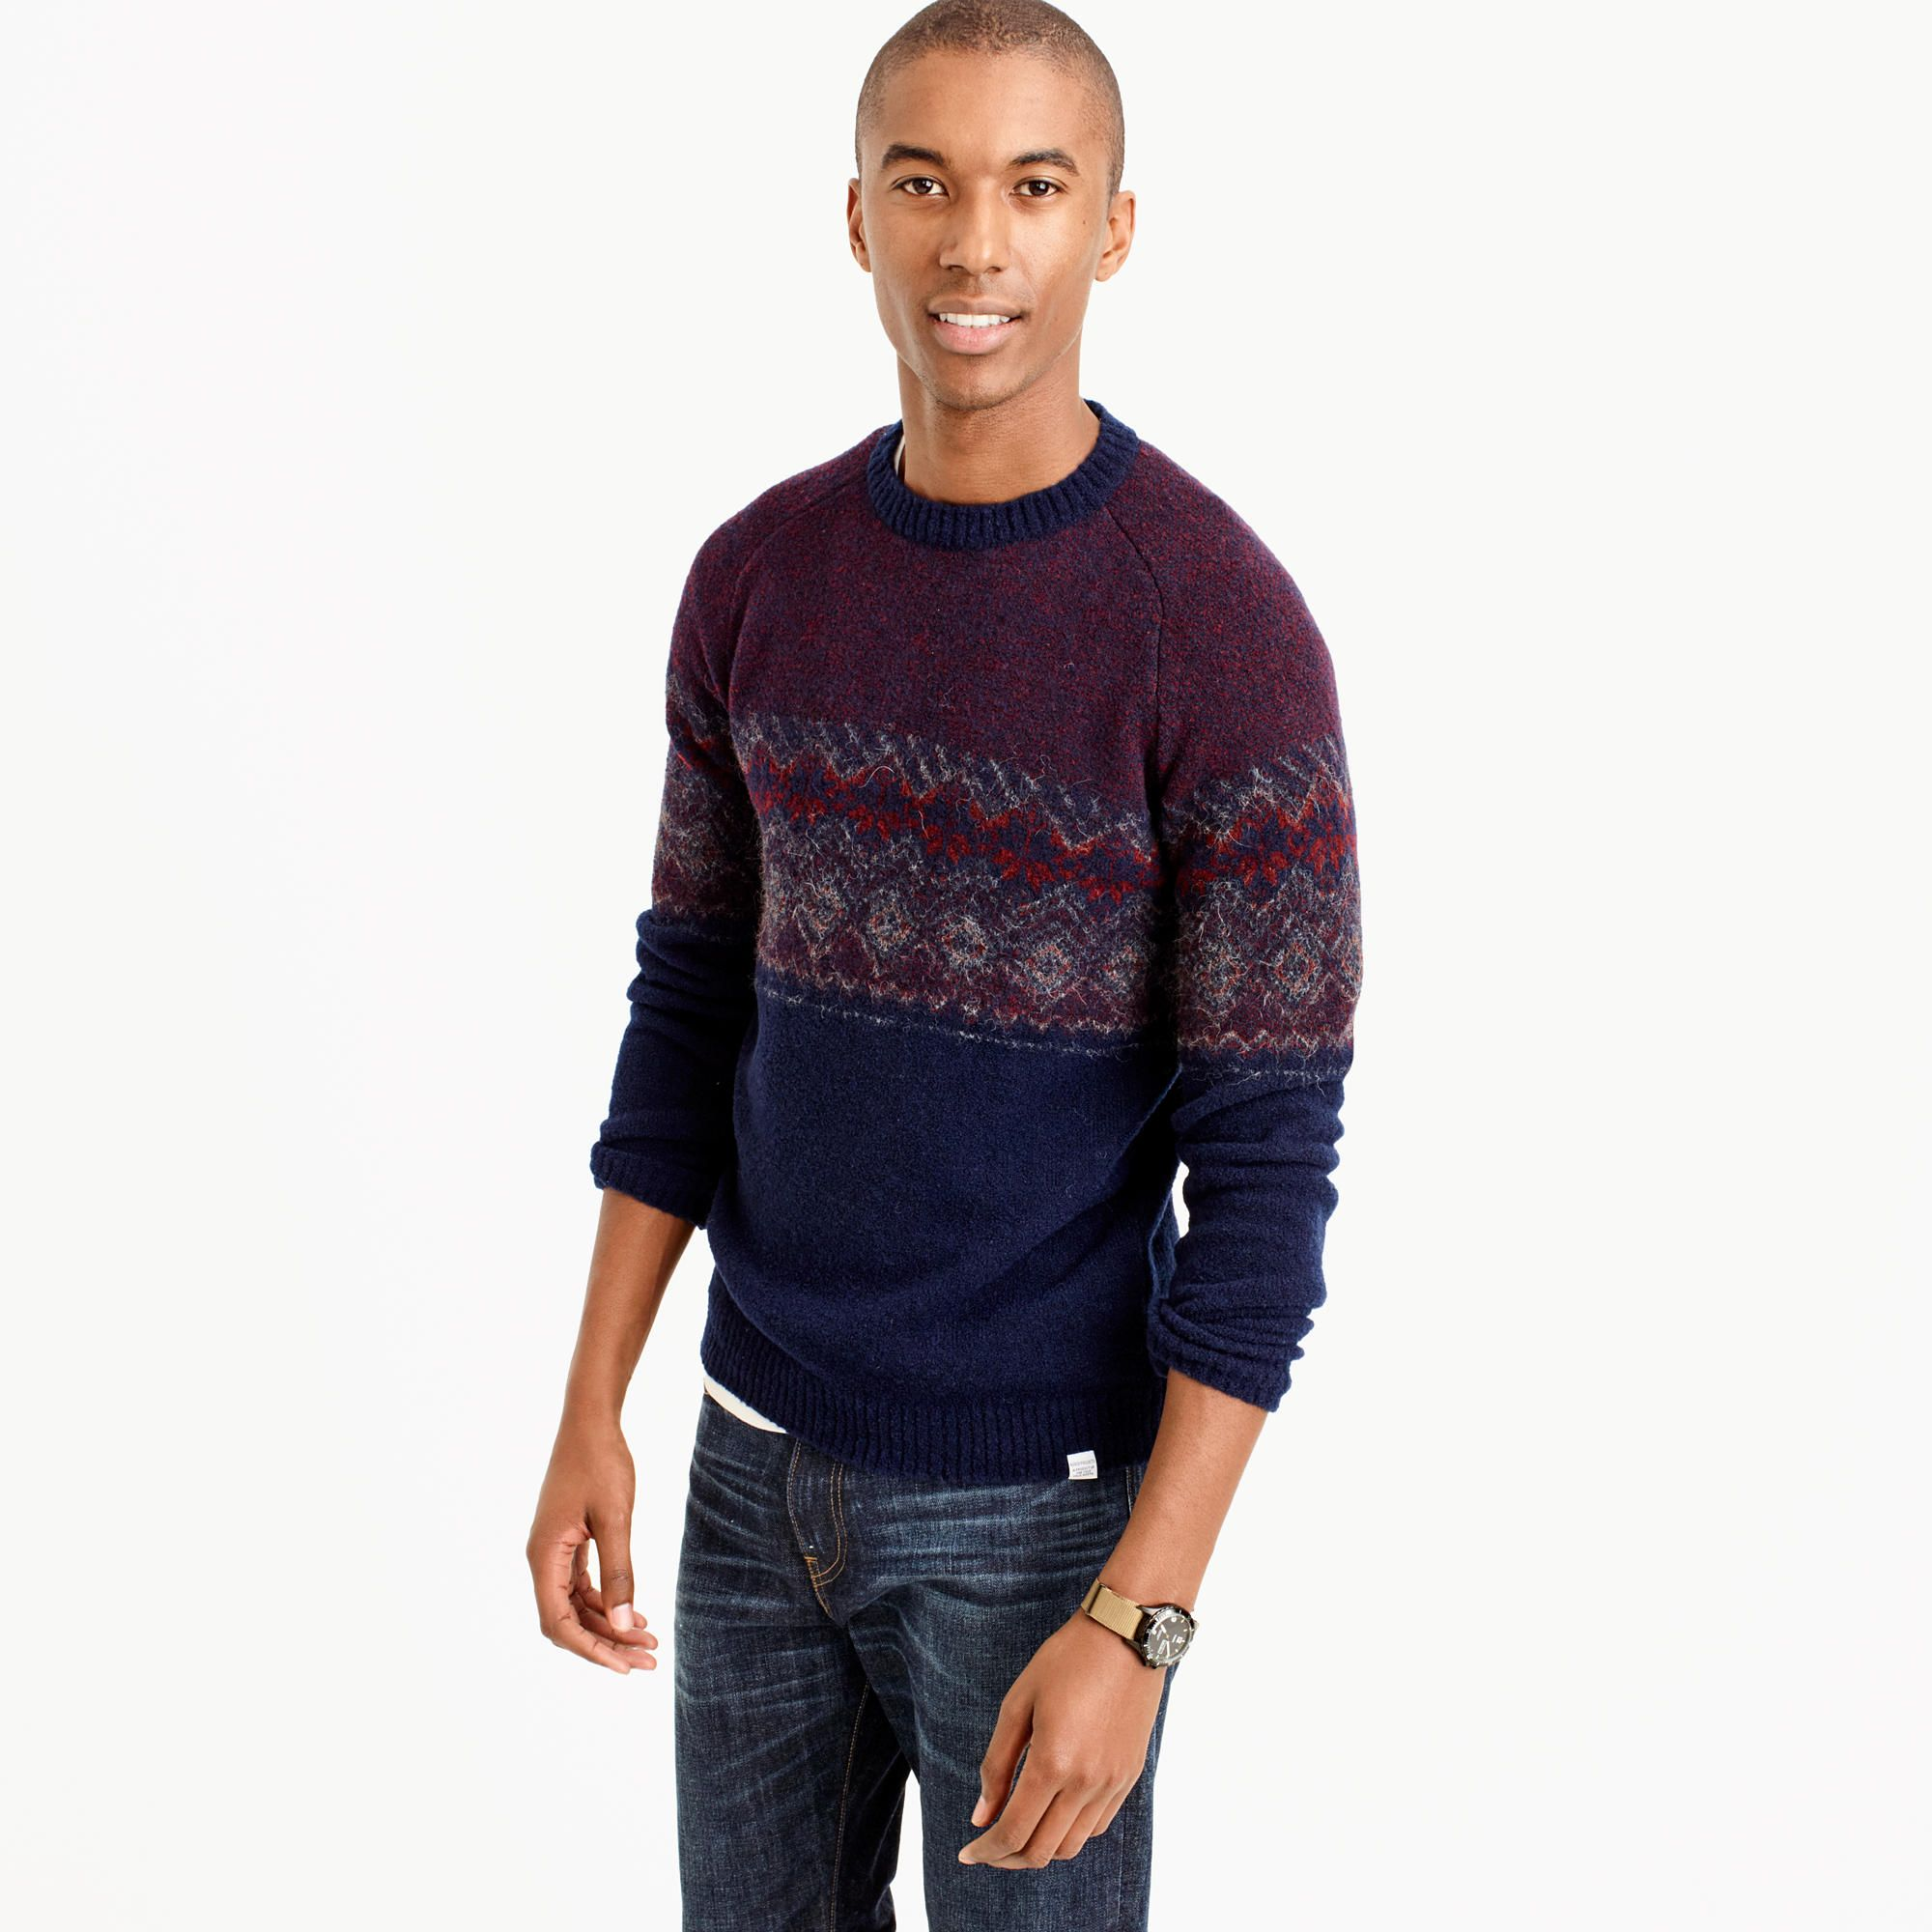 Norse Projects™ Birnir Fair Isle sweater : J.Crew In Good Company ...